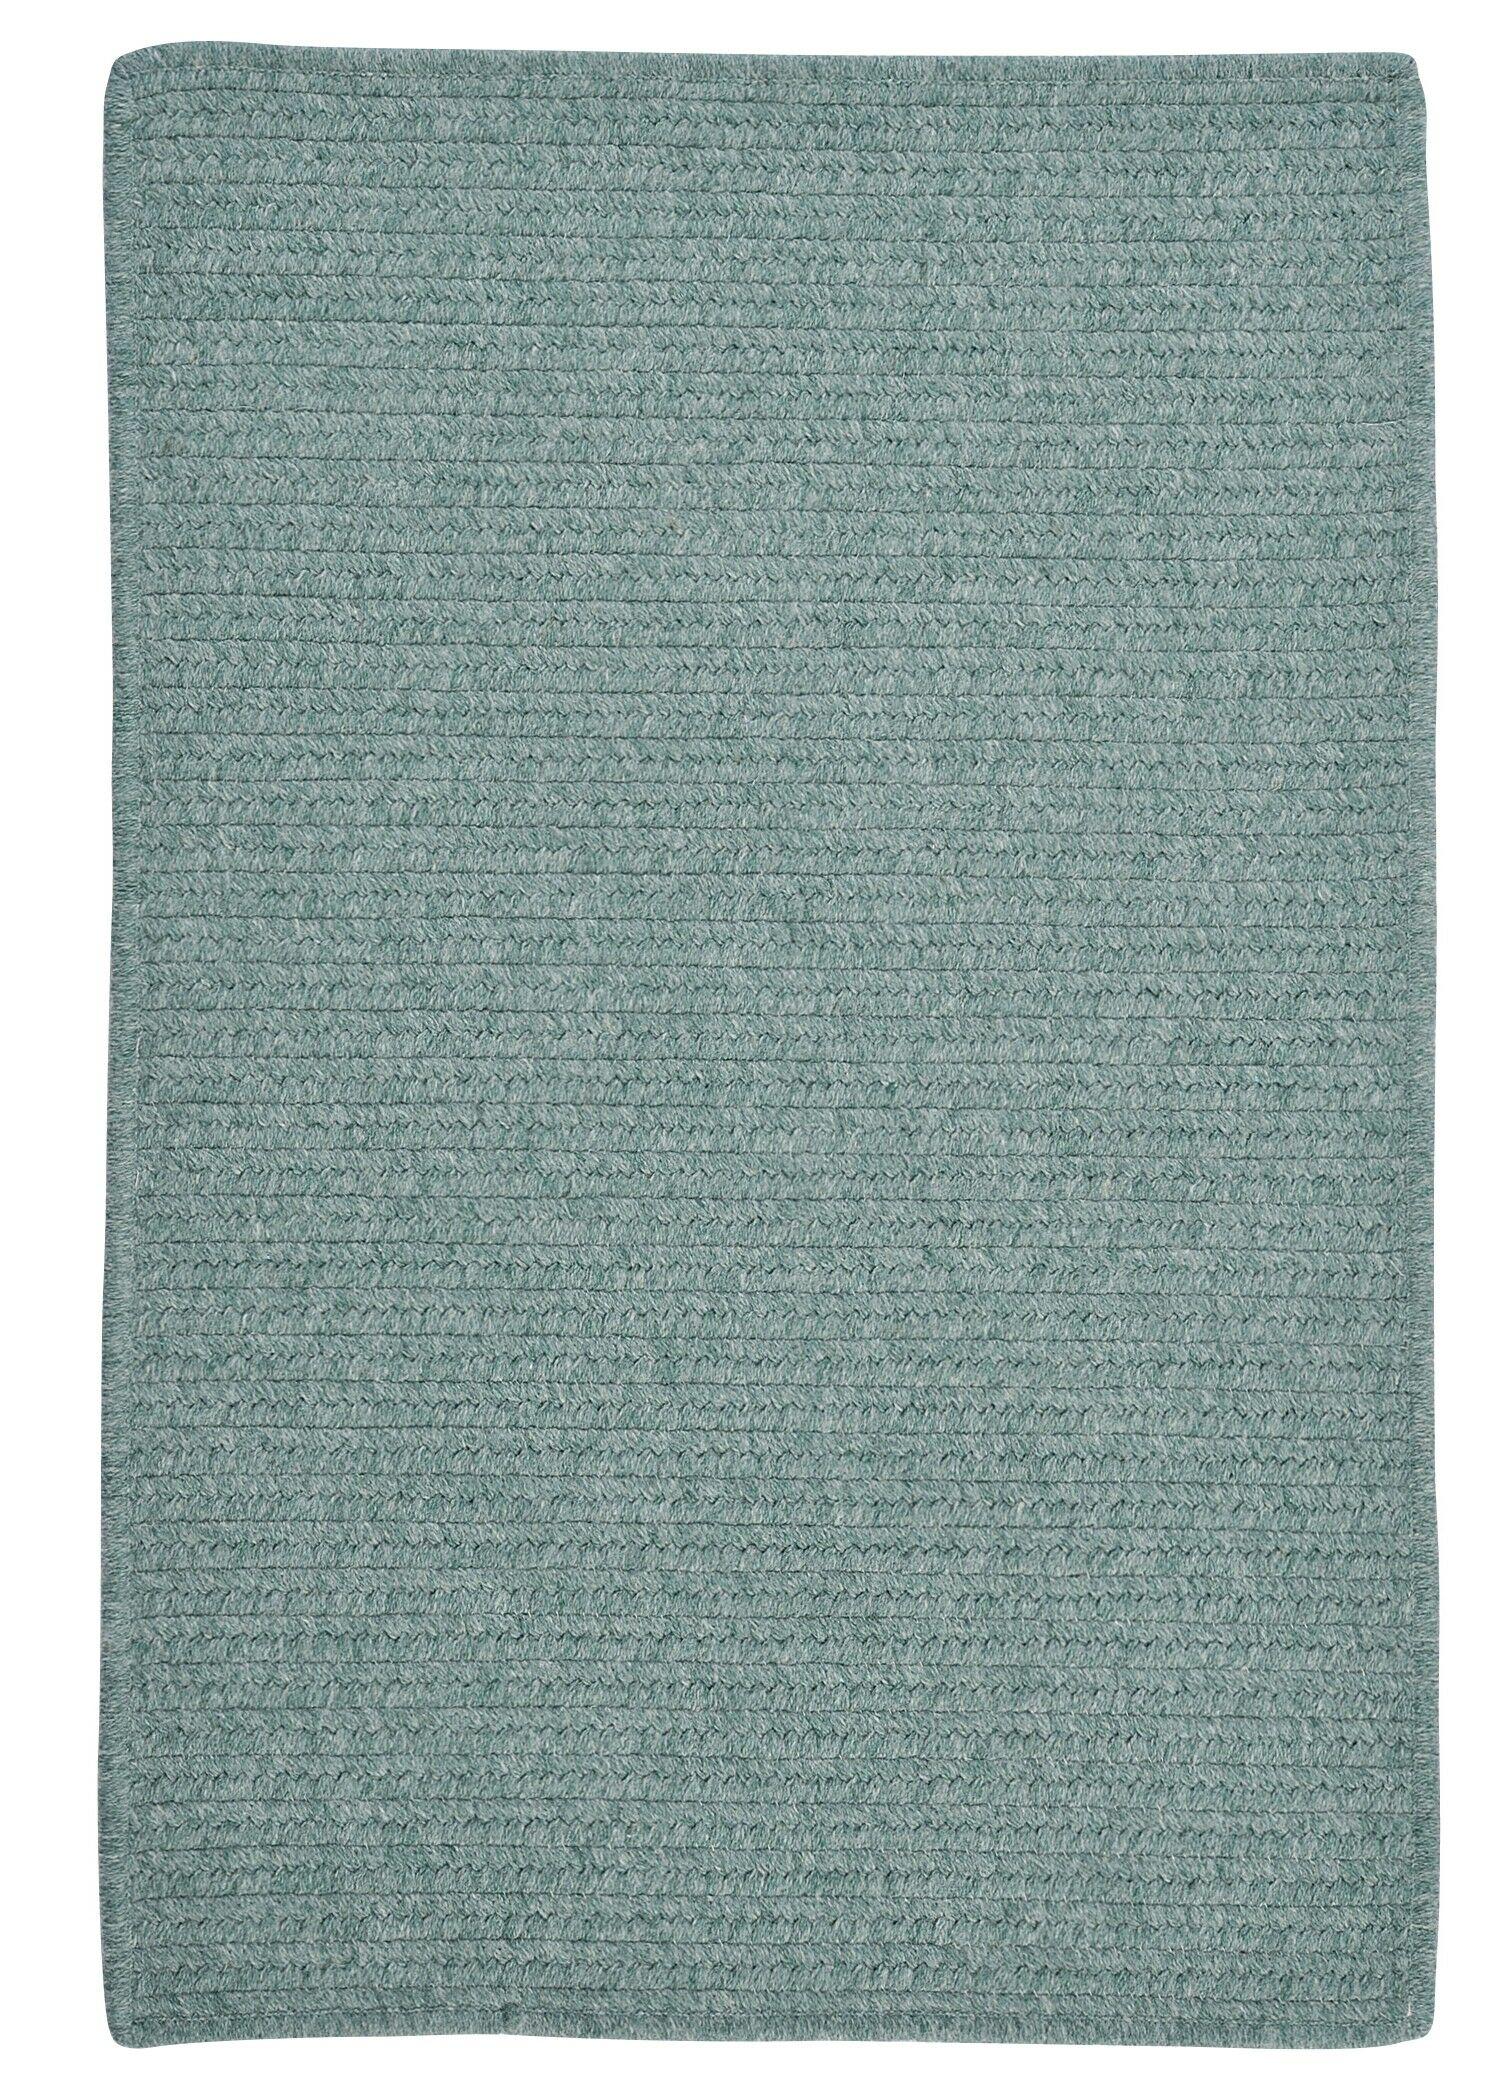 Westminster Teal Area Rug Rug Size: Square 12'